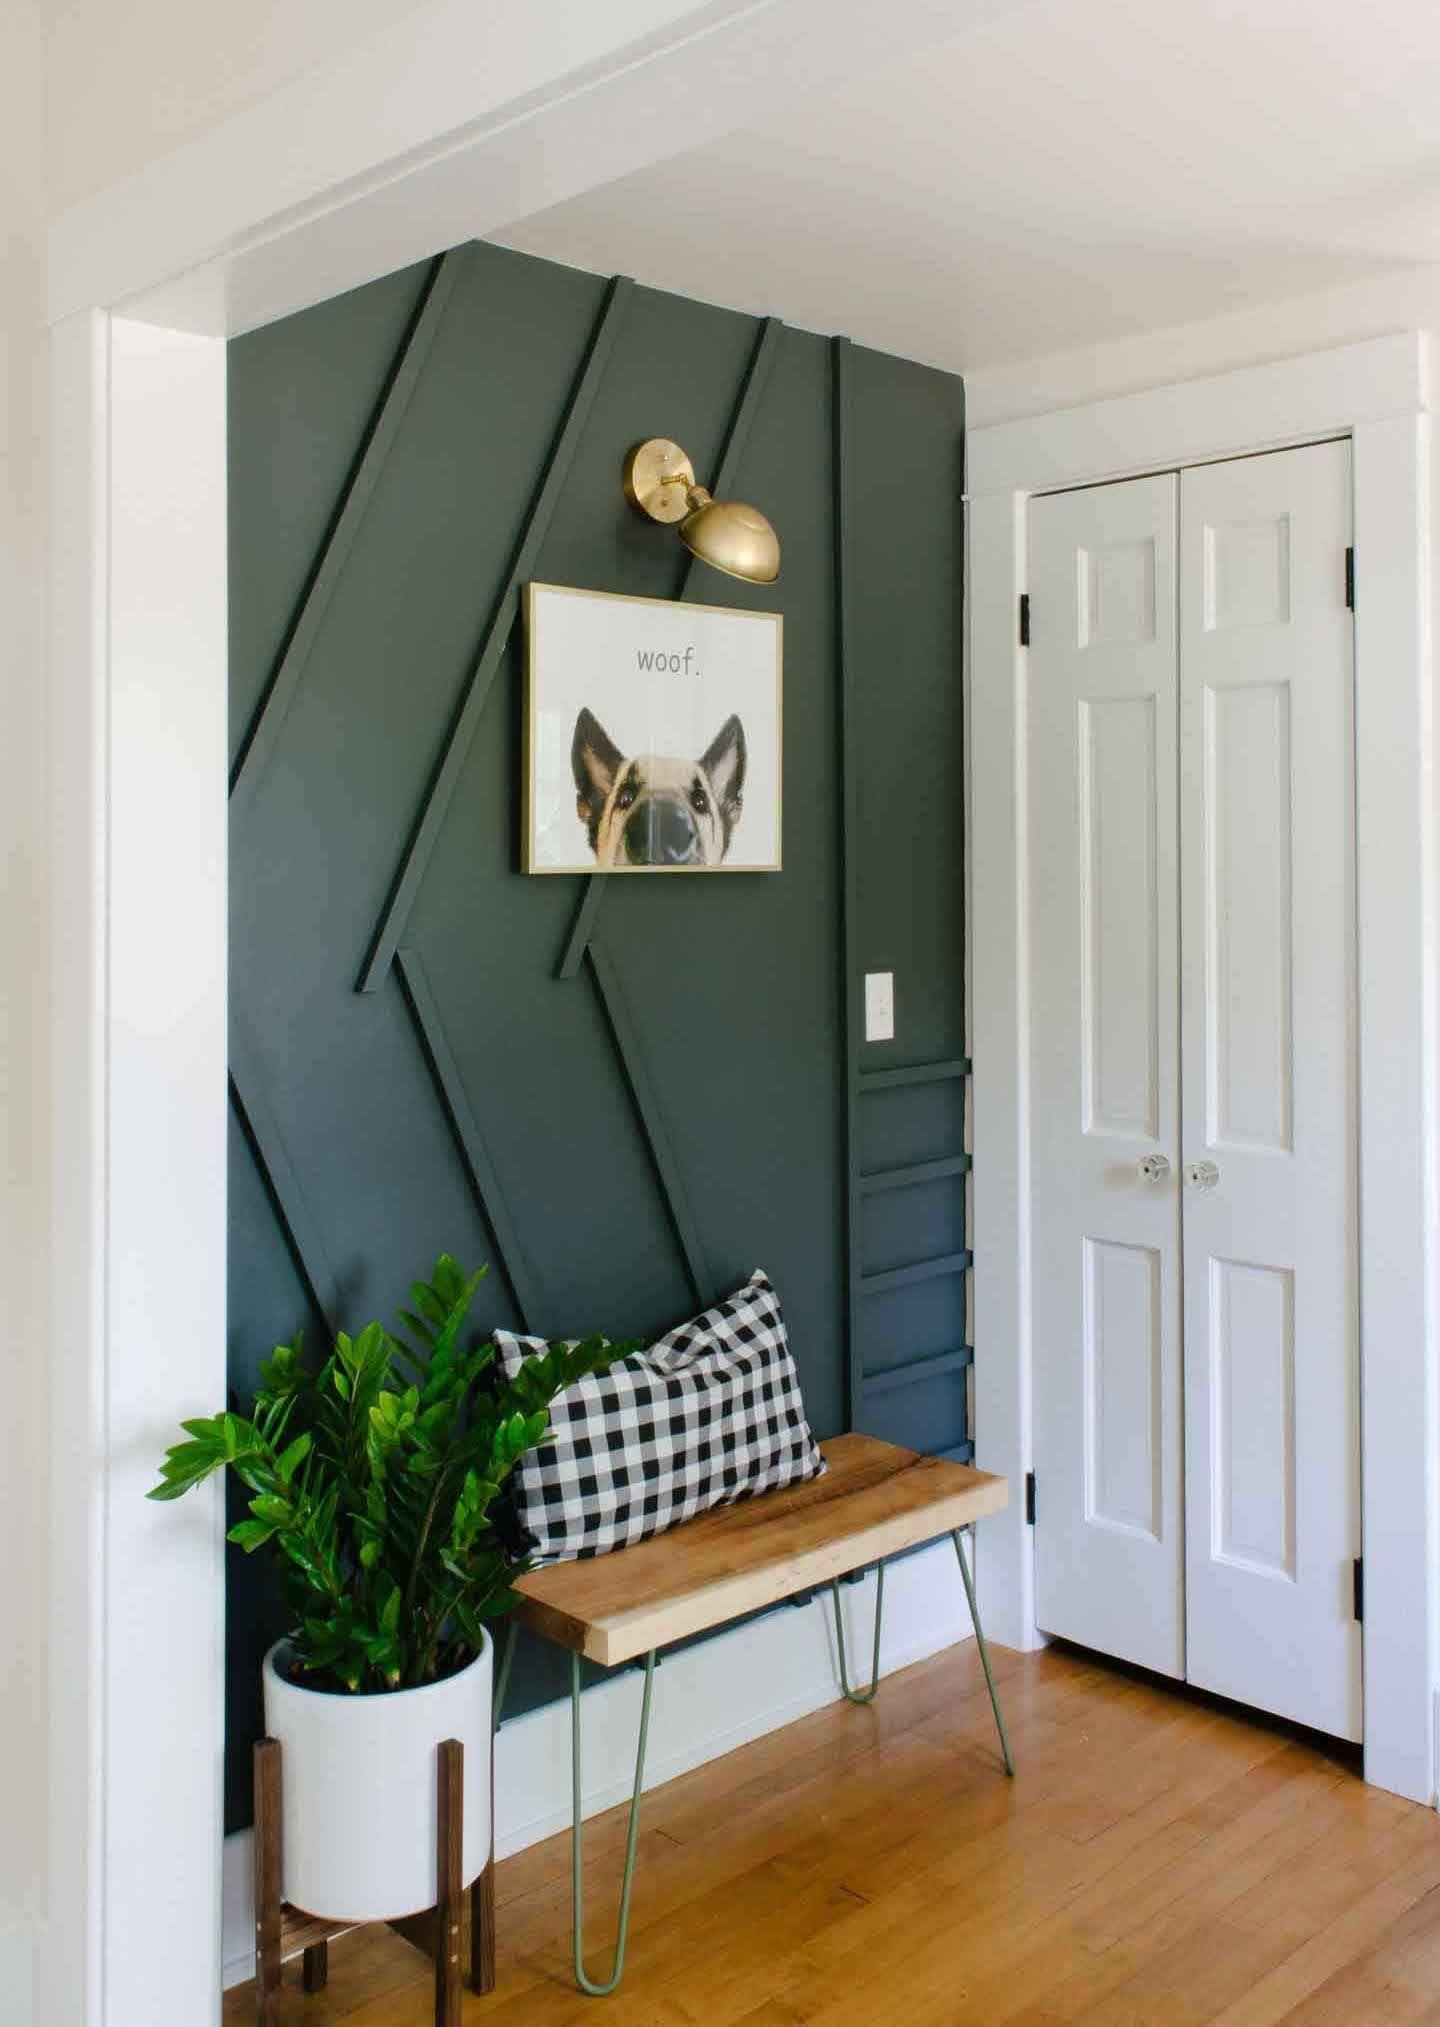 Modern Wood Accent Wall Ideas Decorative Wood Walls Modernhomedecorideas Small Apartment Decorating Apartment Entrance Apartment Decor